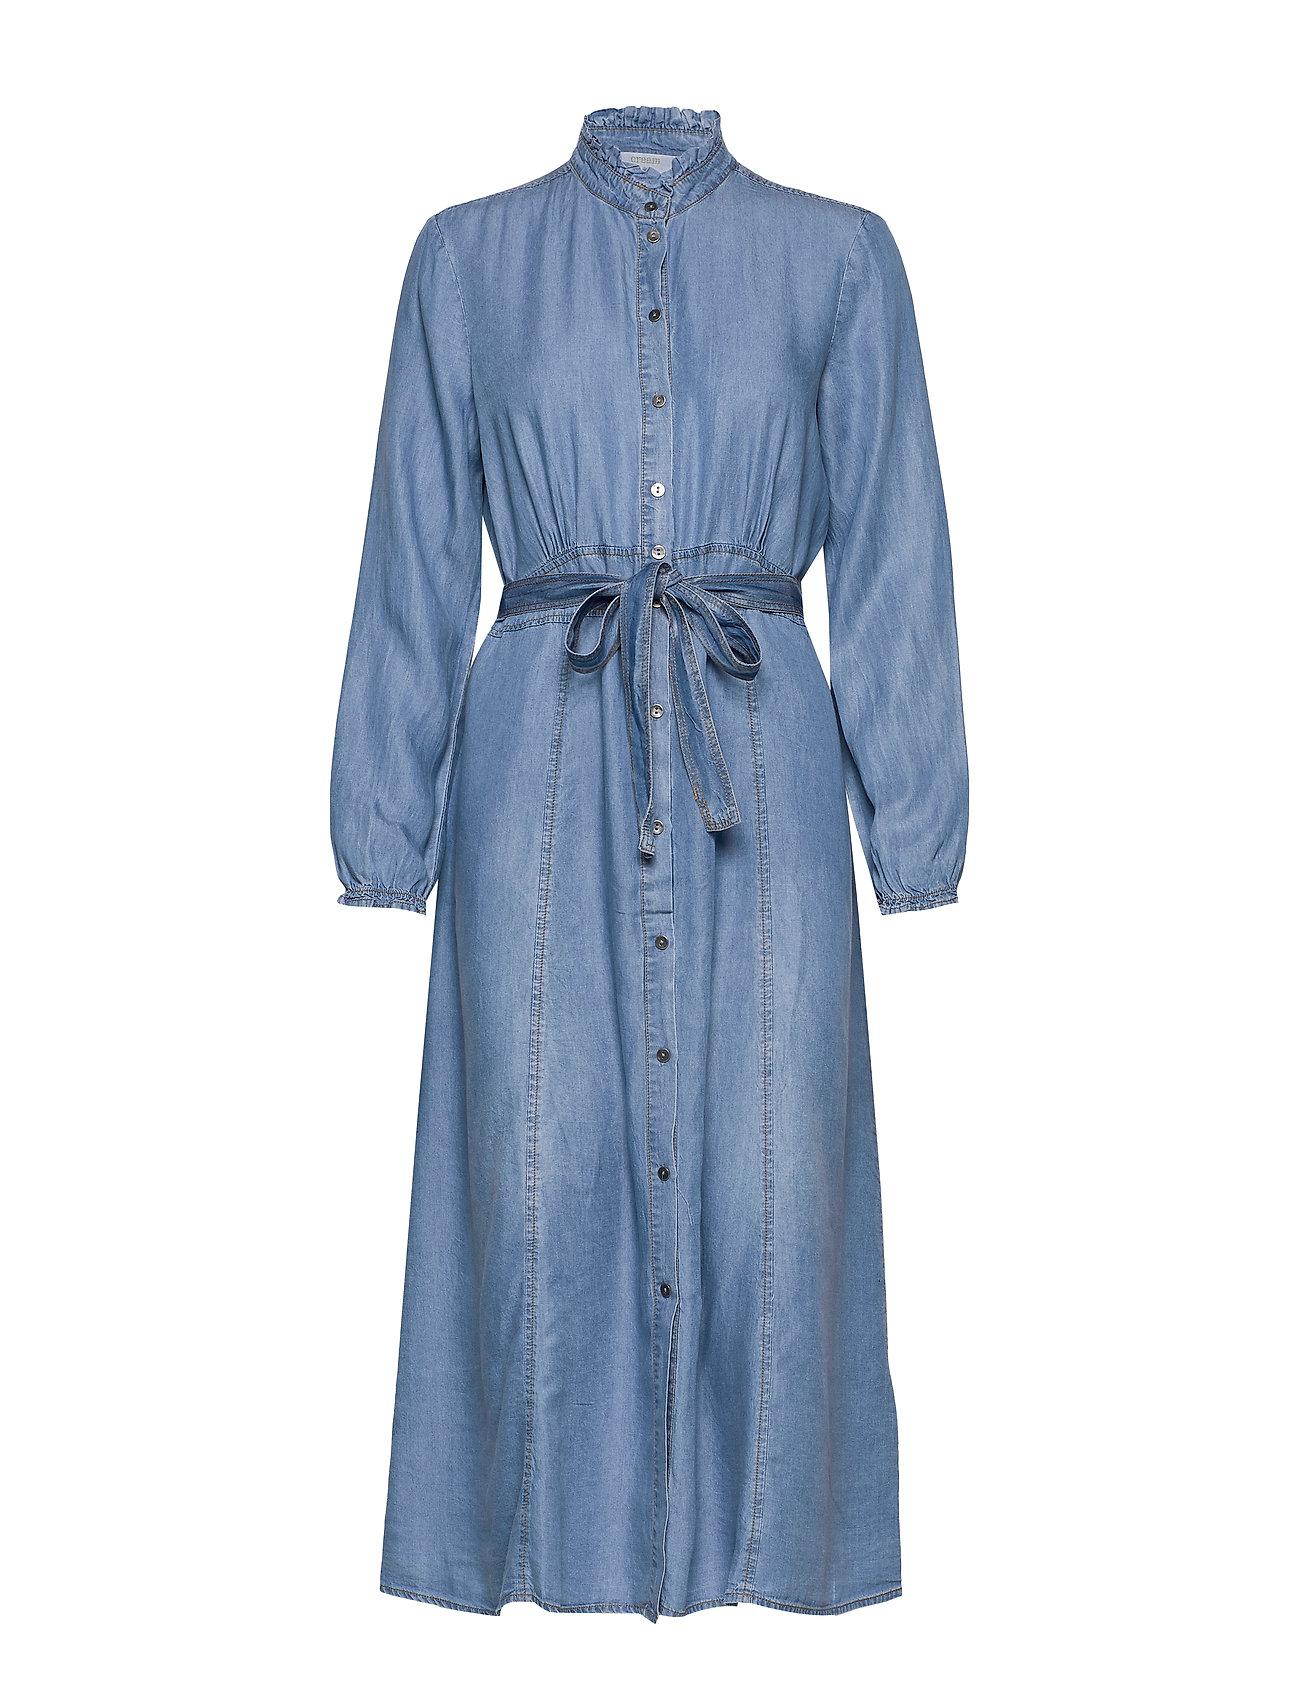 Cream VincaCr dress - BLUE DENIM